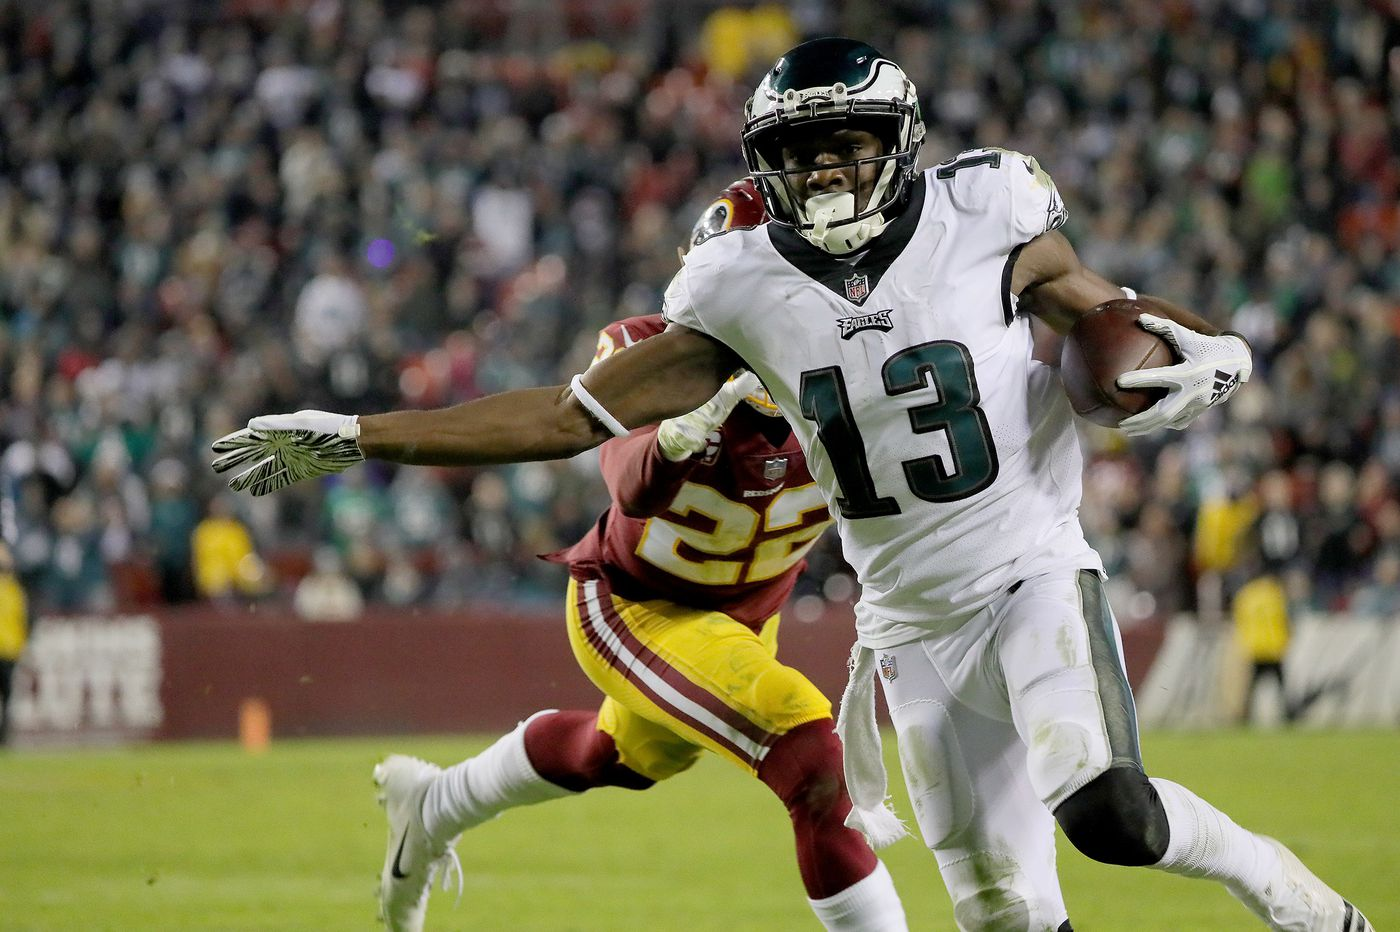 NFL playoffs: Eagles-Bears first-round game kicks at 4:40 p.m. Sunday